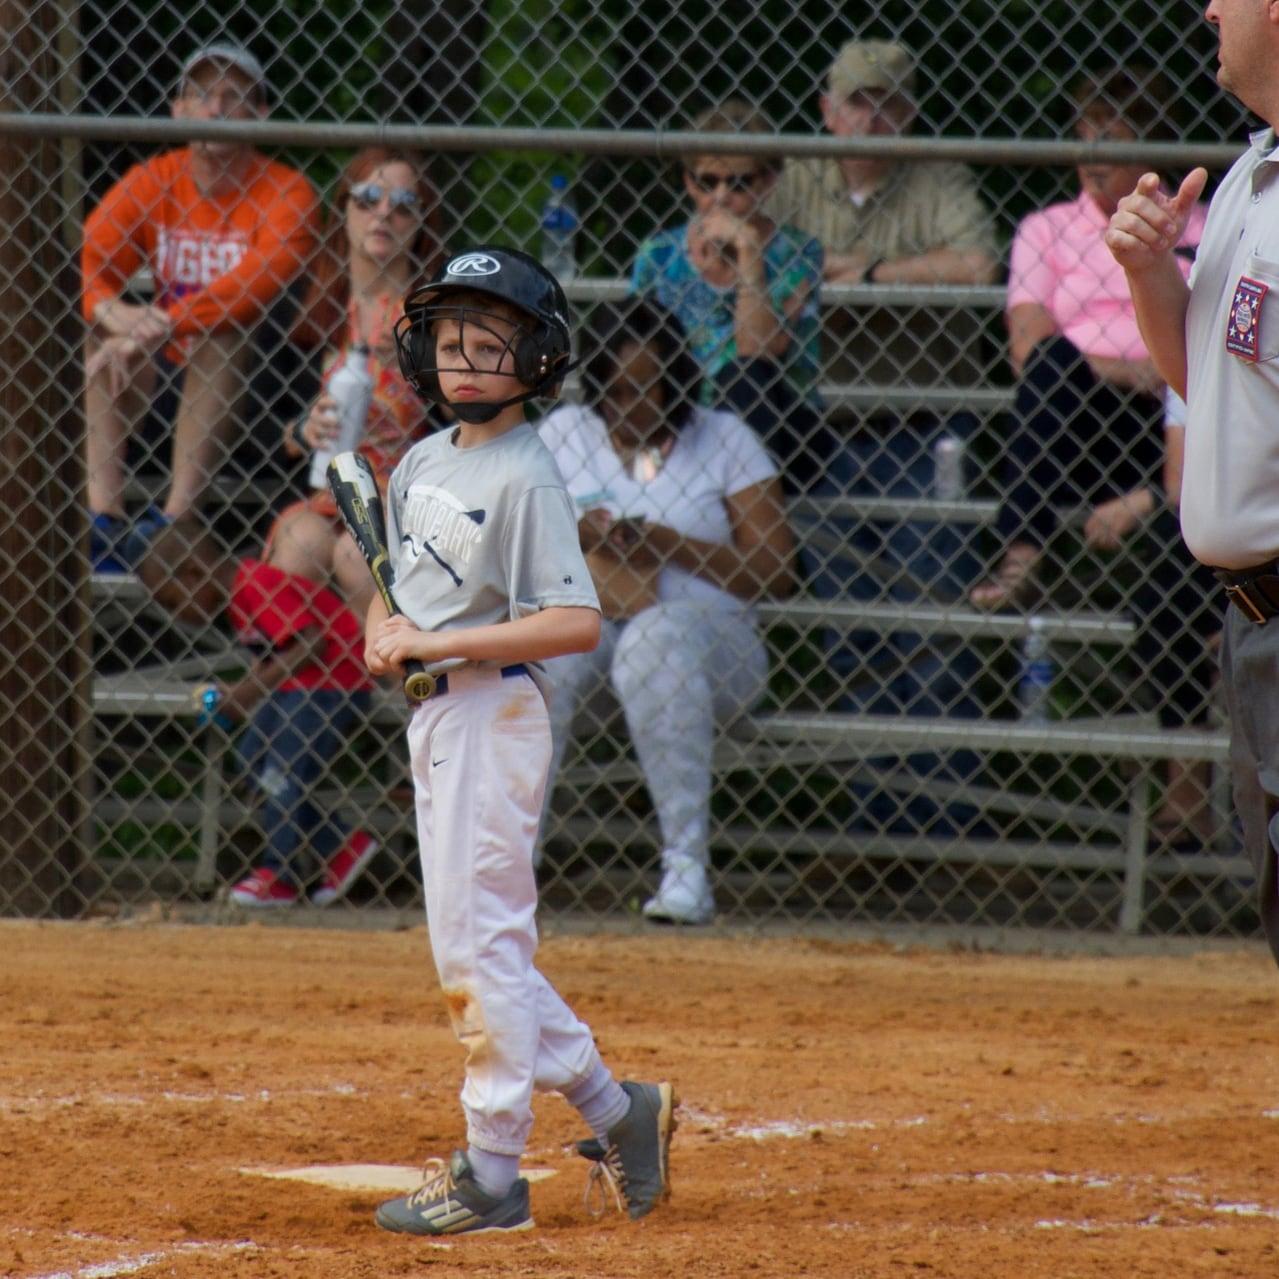 East Side Baseball Association